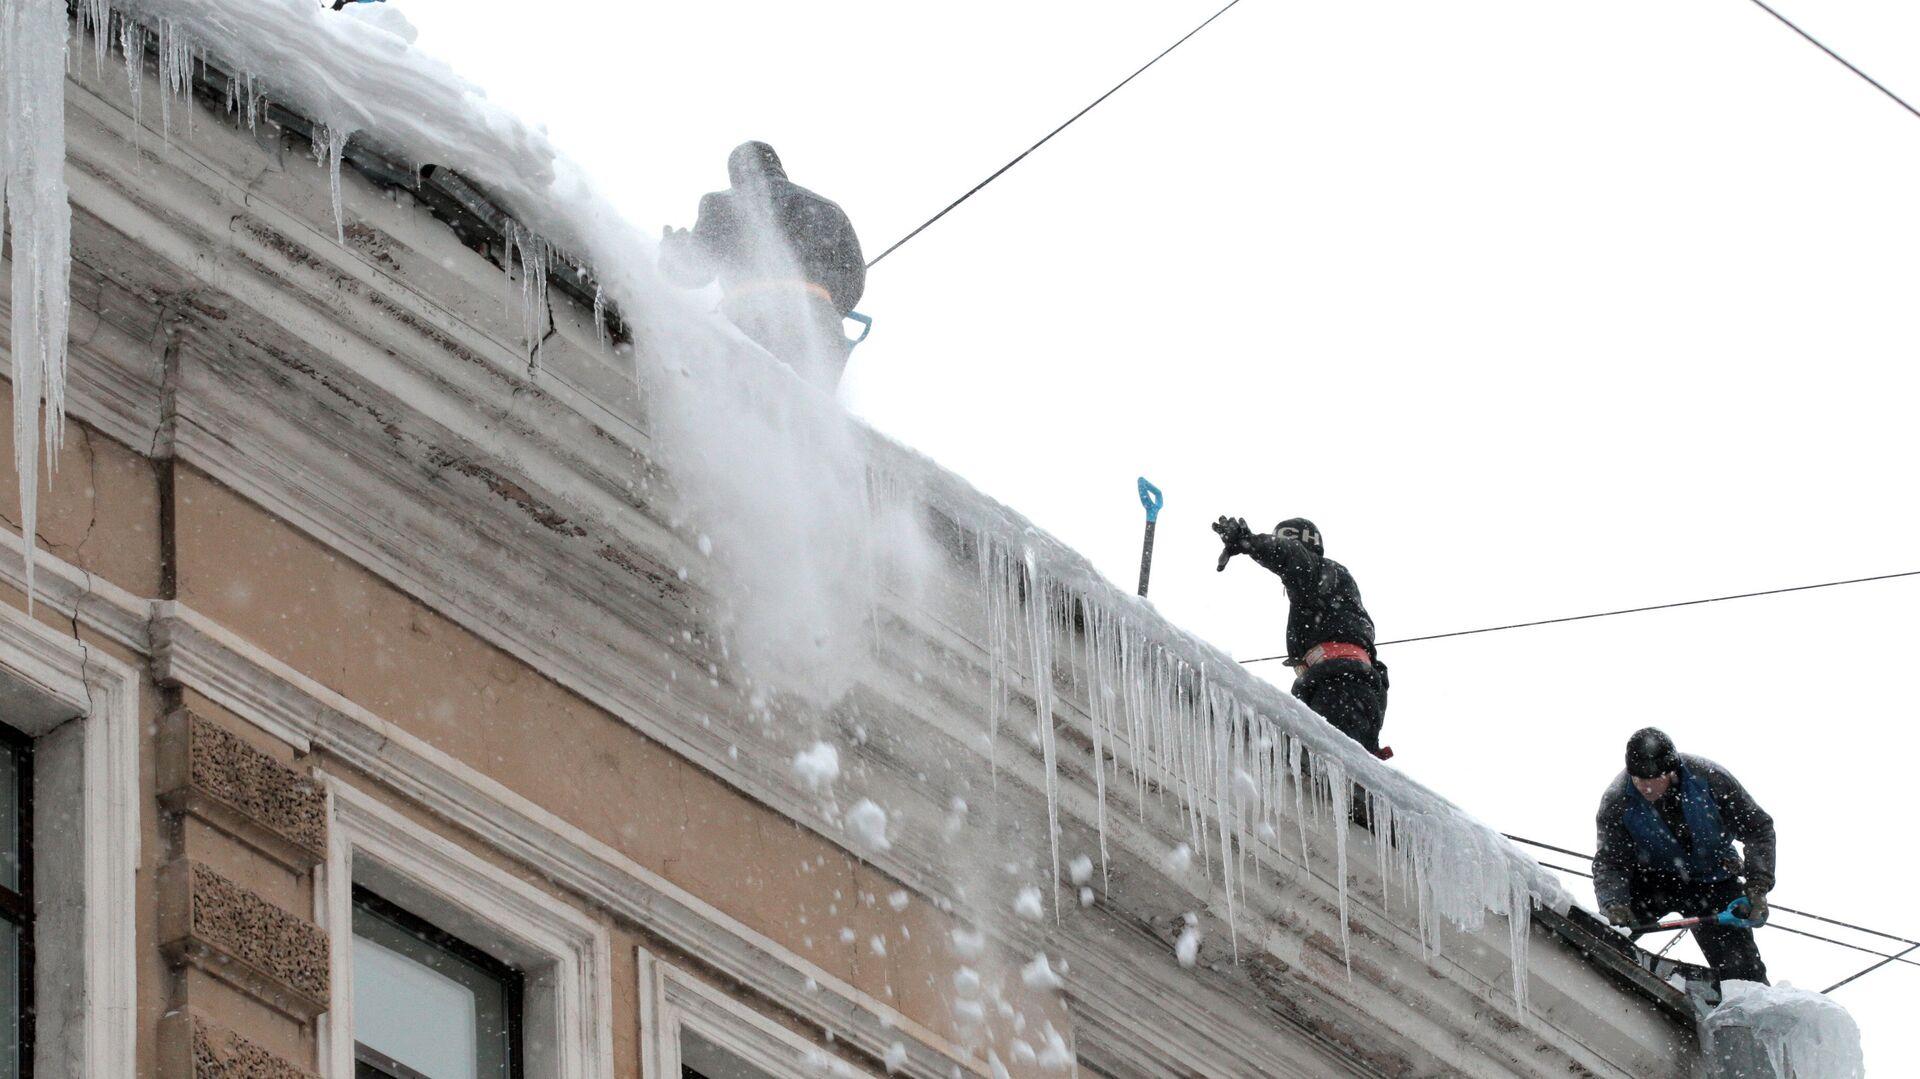 Уборка снега на улицах Санкт-Петербурга - РИА Новости, 1920, 21.10.2020